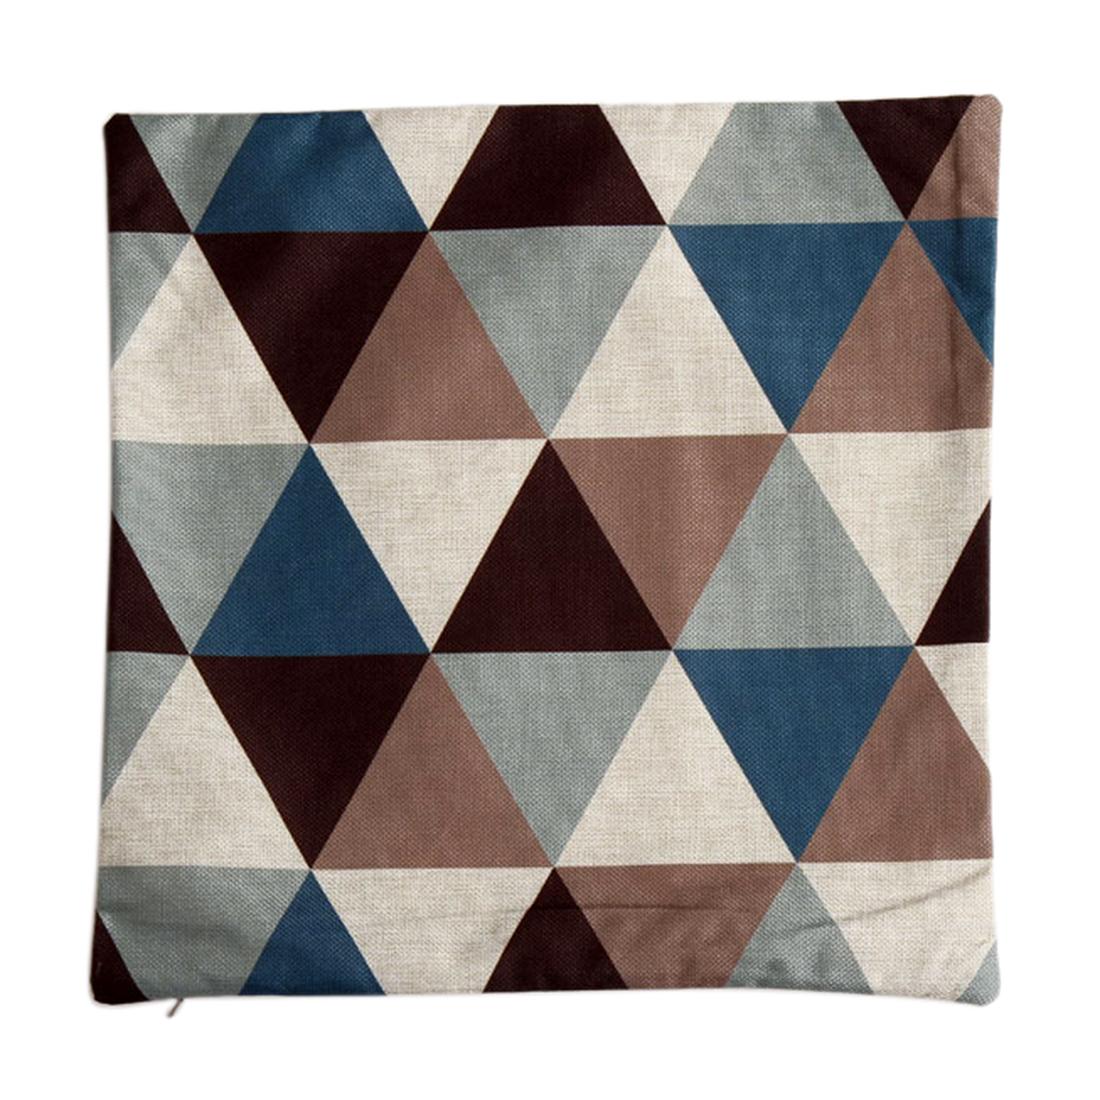 Piccocasa Sofa Linen Blue Rhombus Pattern Cushion Cover Pillow Case 45 x 45cm